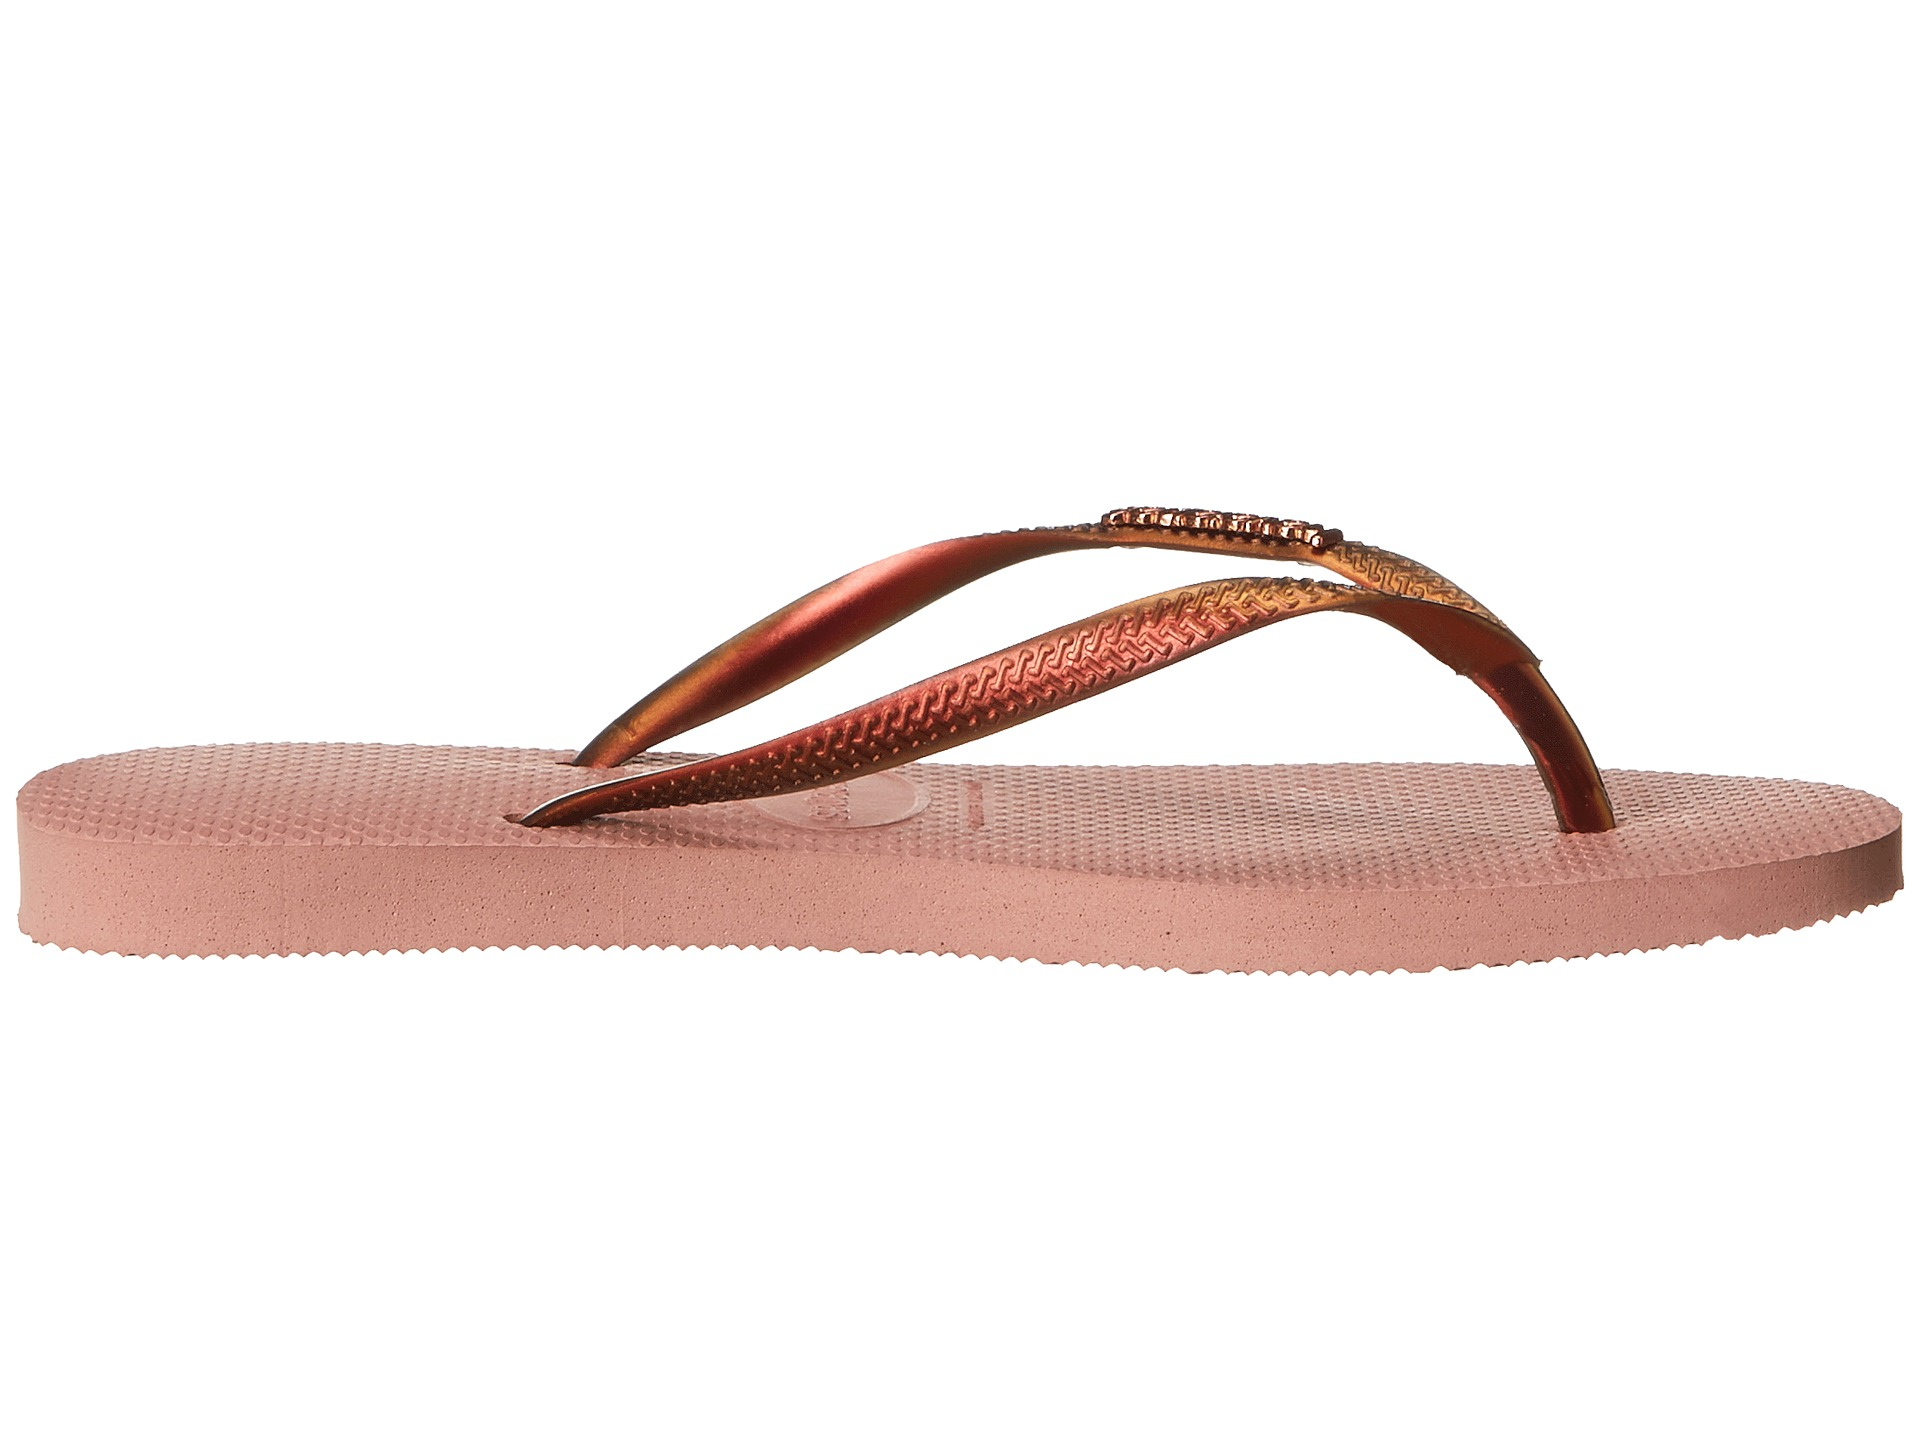 5668e0b2d Lyst - Havaianas Slim Furta Cor Flip Flops in Pink